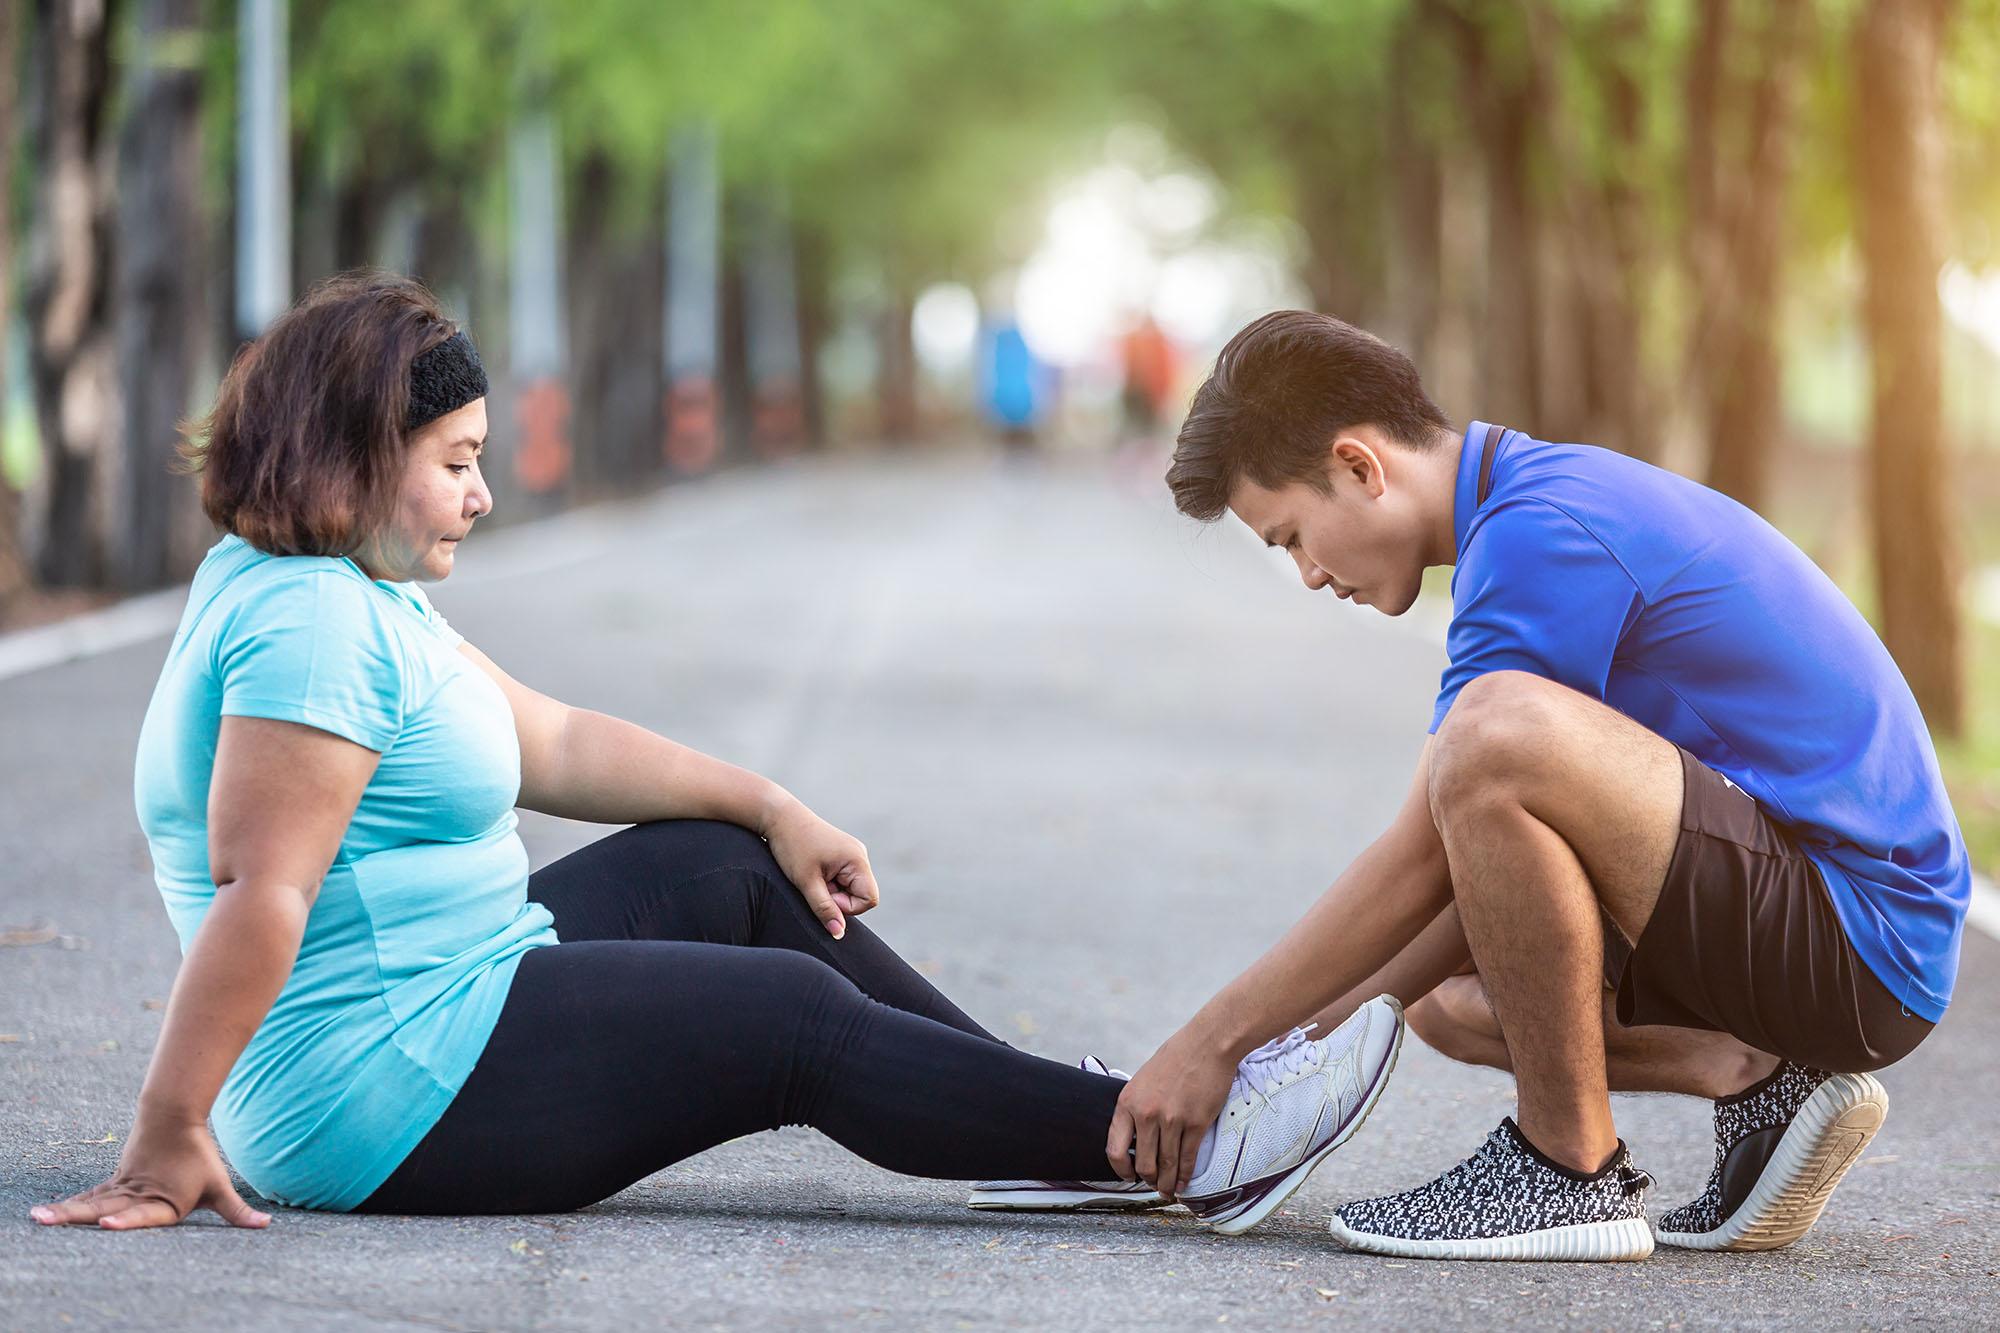 Lateral Ankle Sprain | Treatment & Rehab Strategies